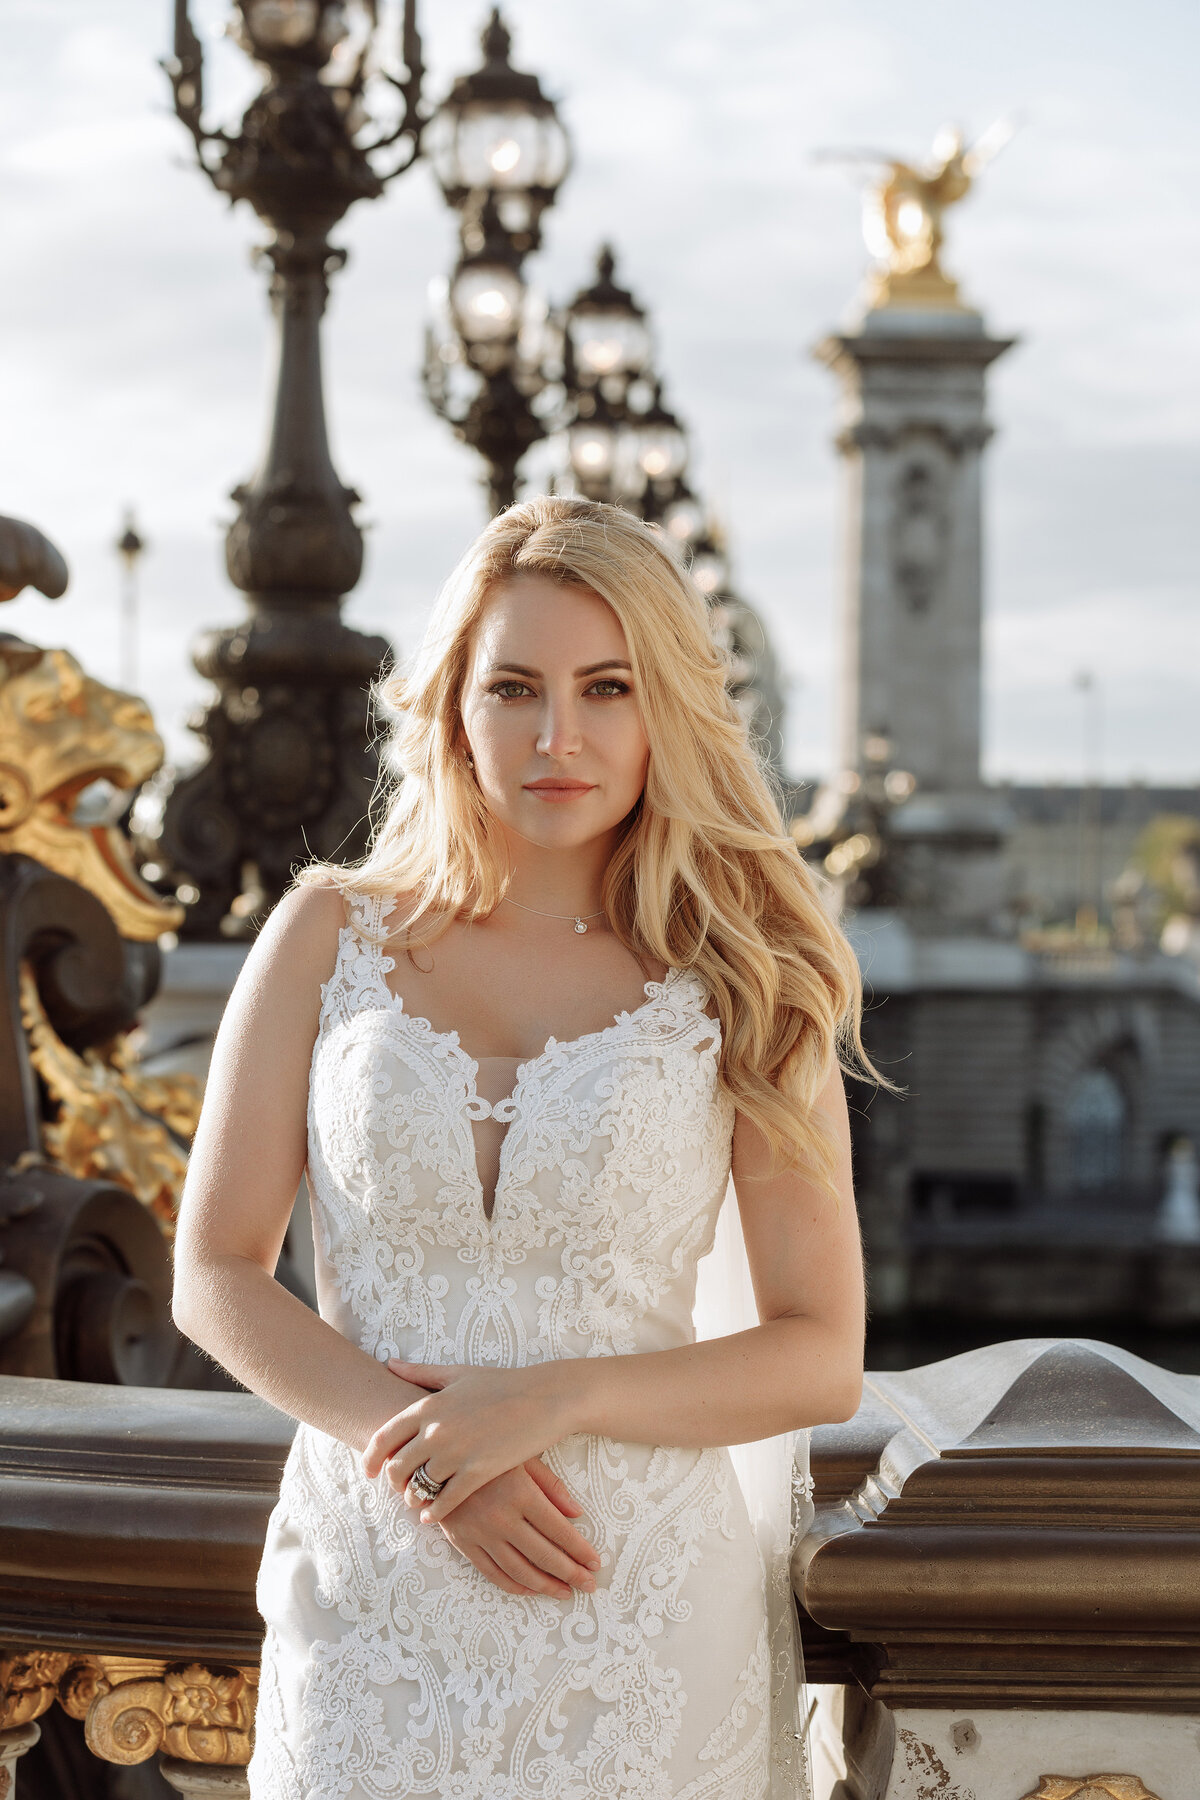 топ русских фотографов воспевали